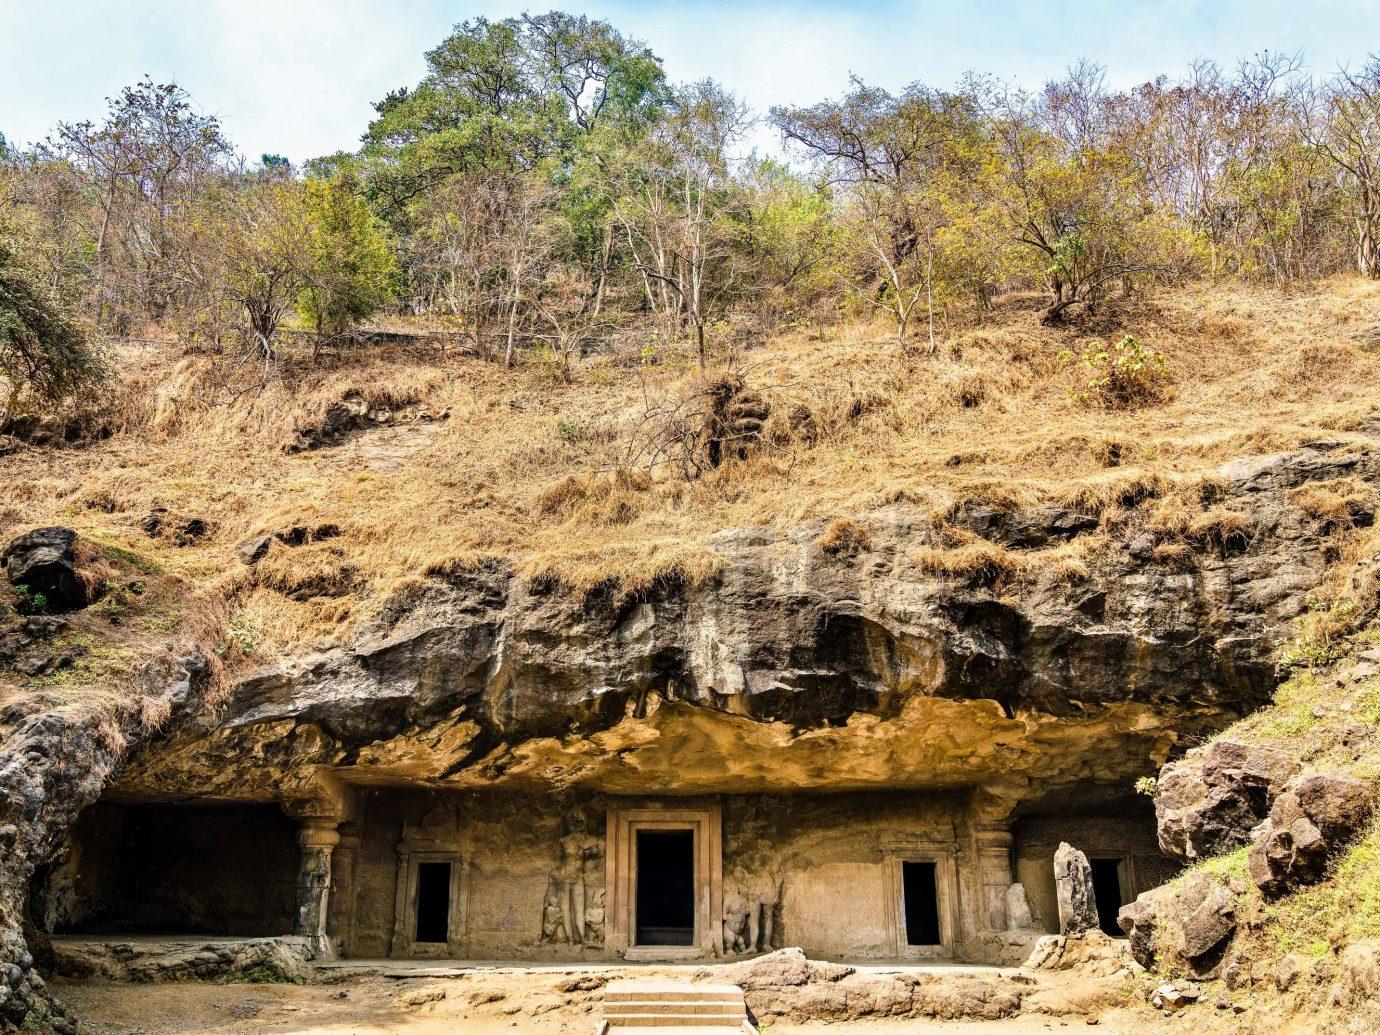 India archaeological site rock Ruins historic site outcrop geology bedrock formation escarpment plant community landscape ancient history